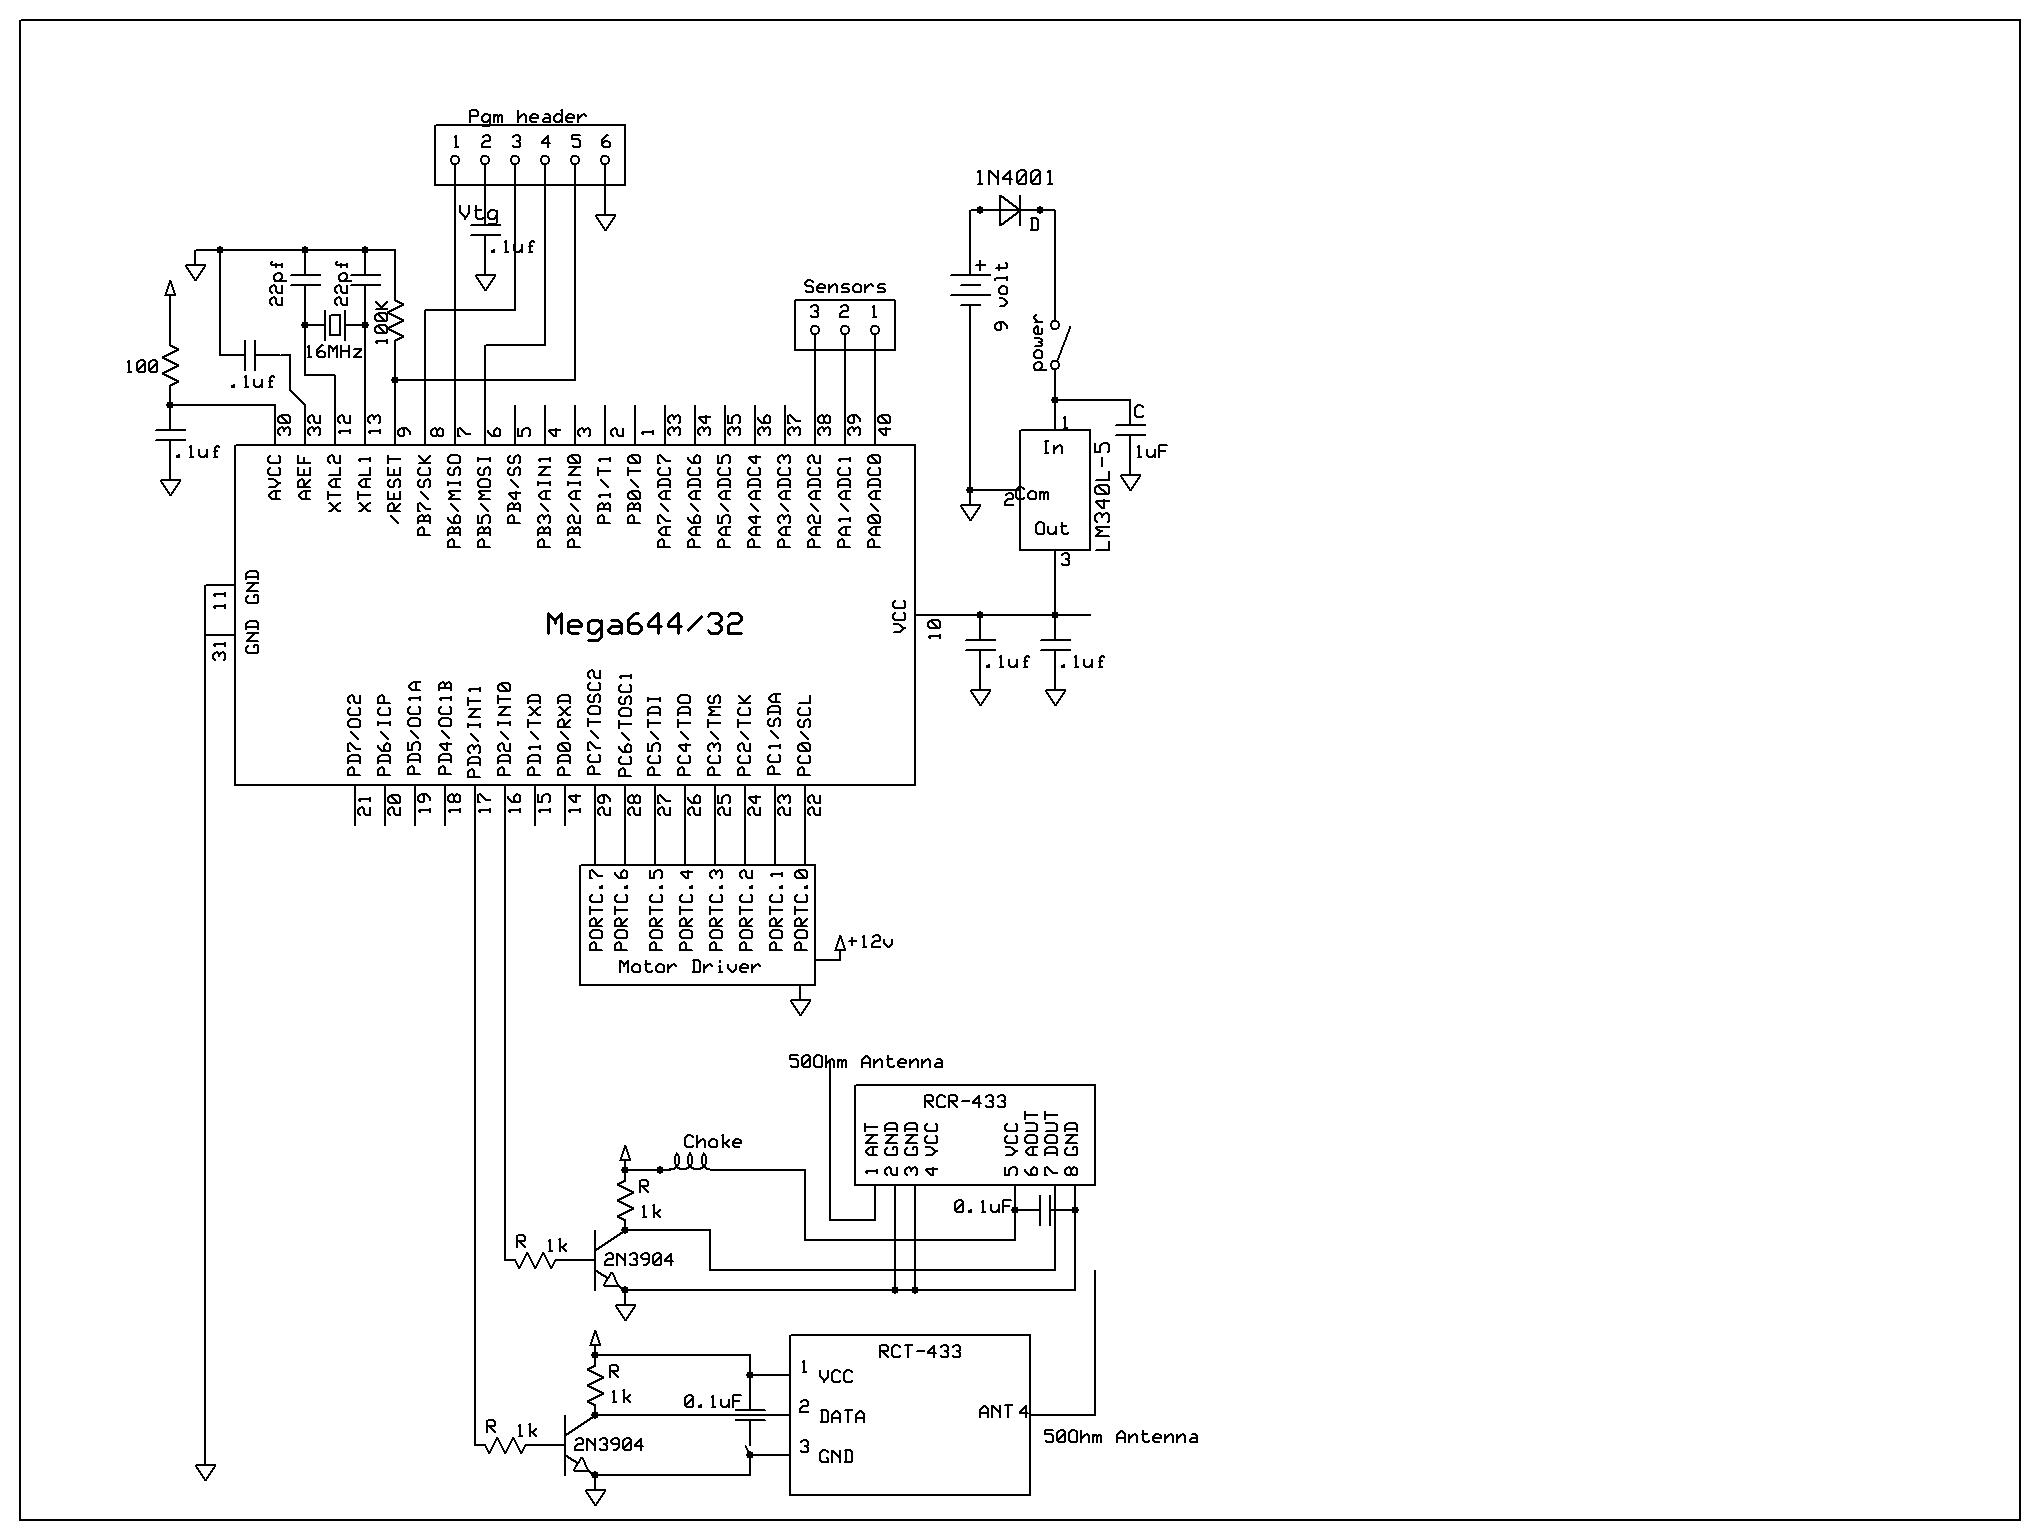 duplex pump control panel wiring diagram rj45 cat5e lift station